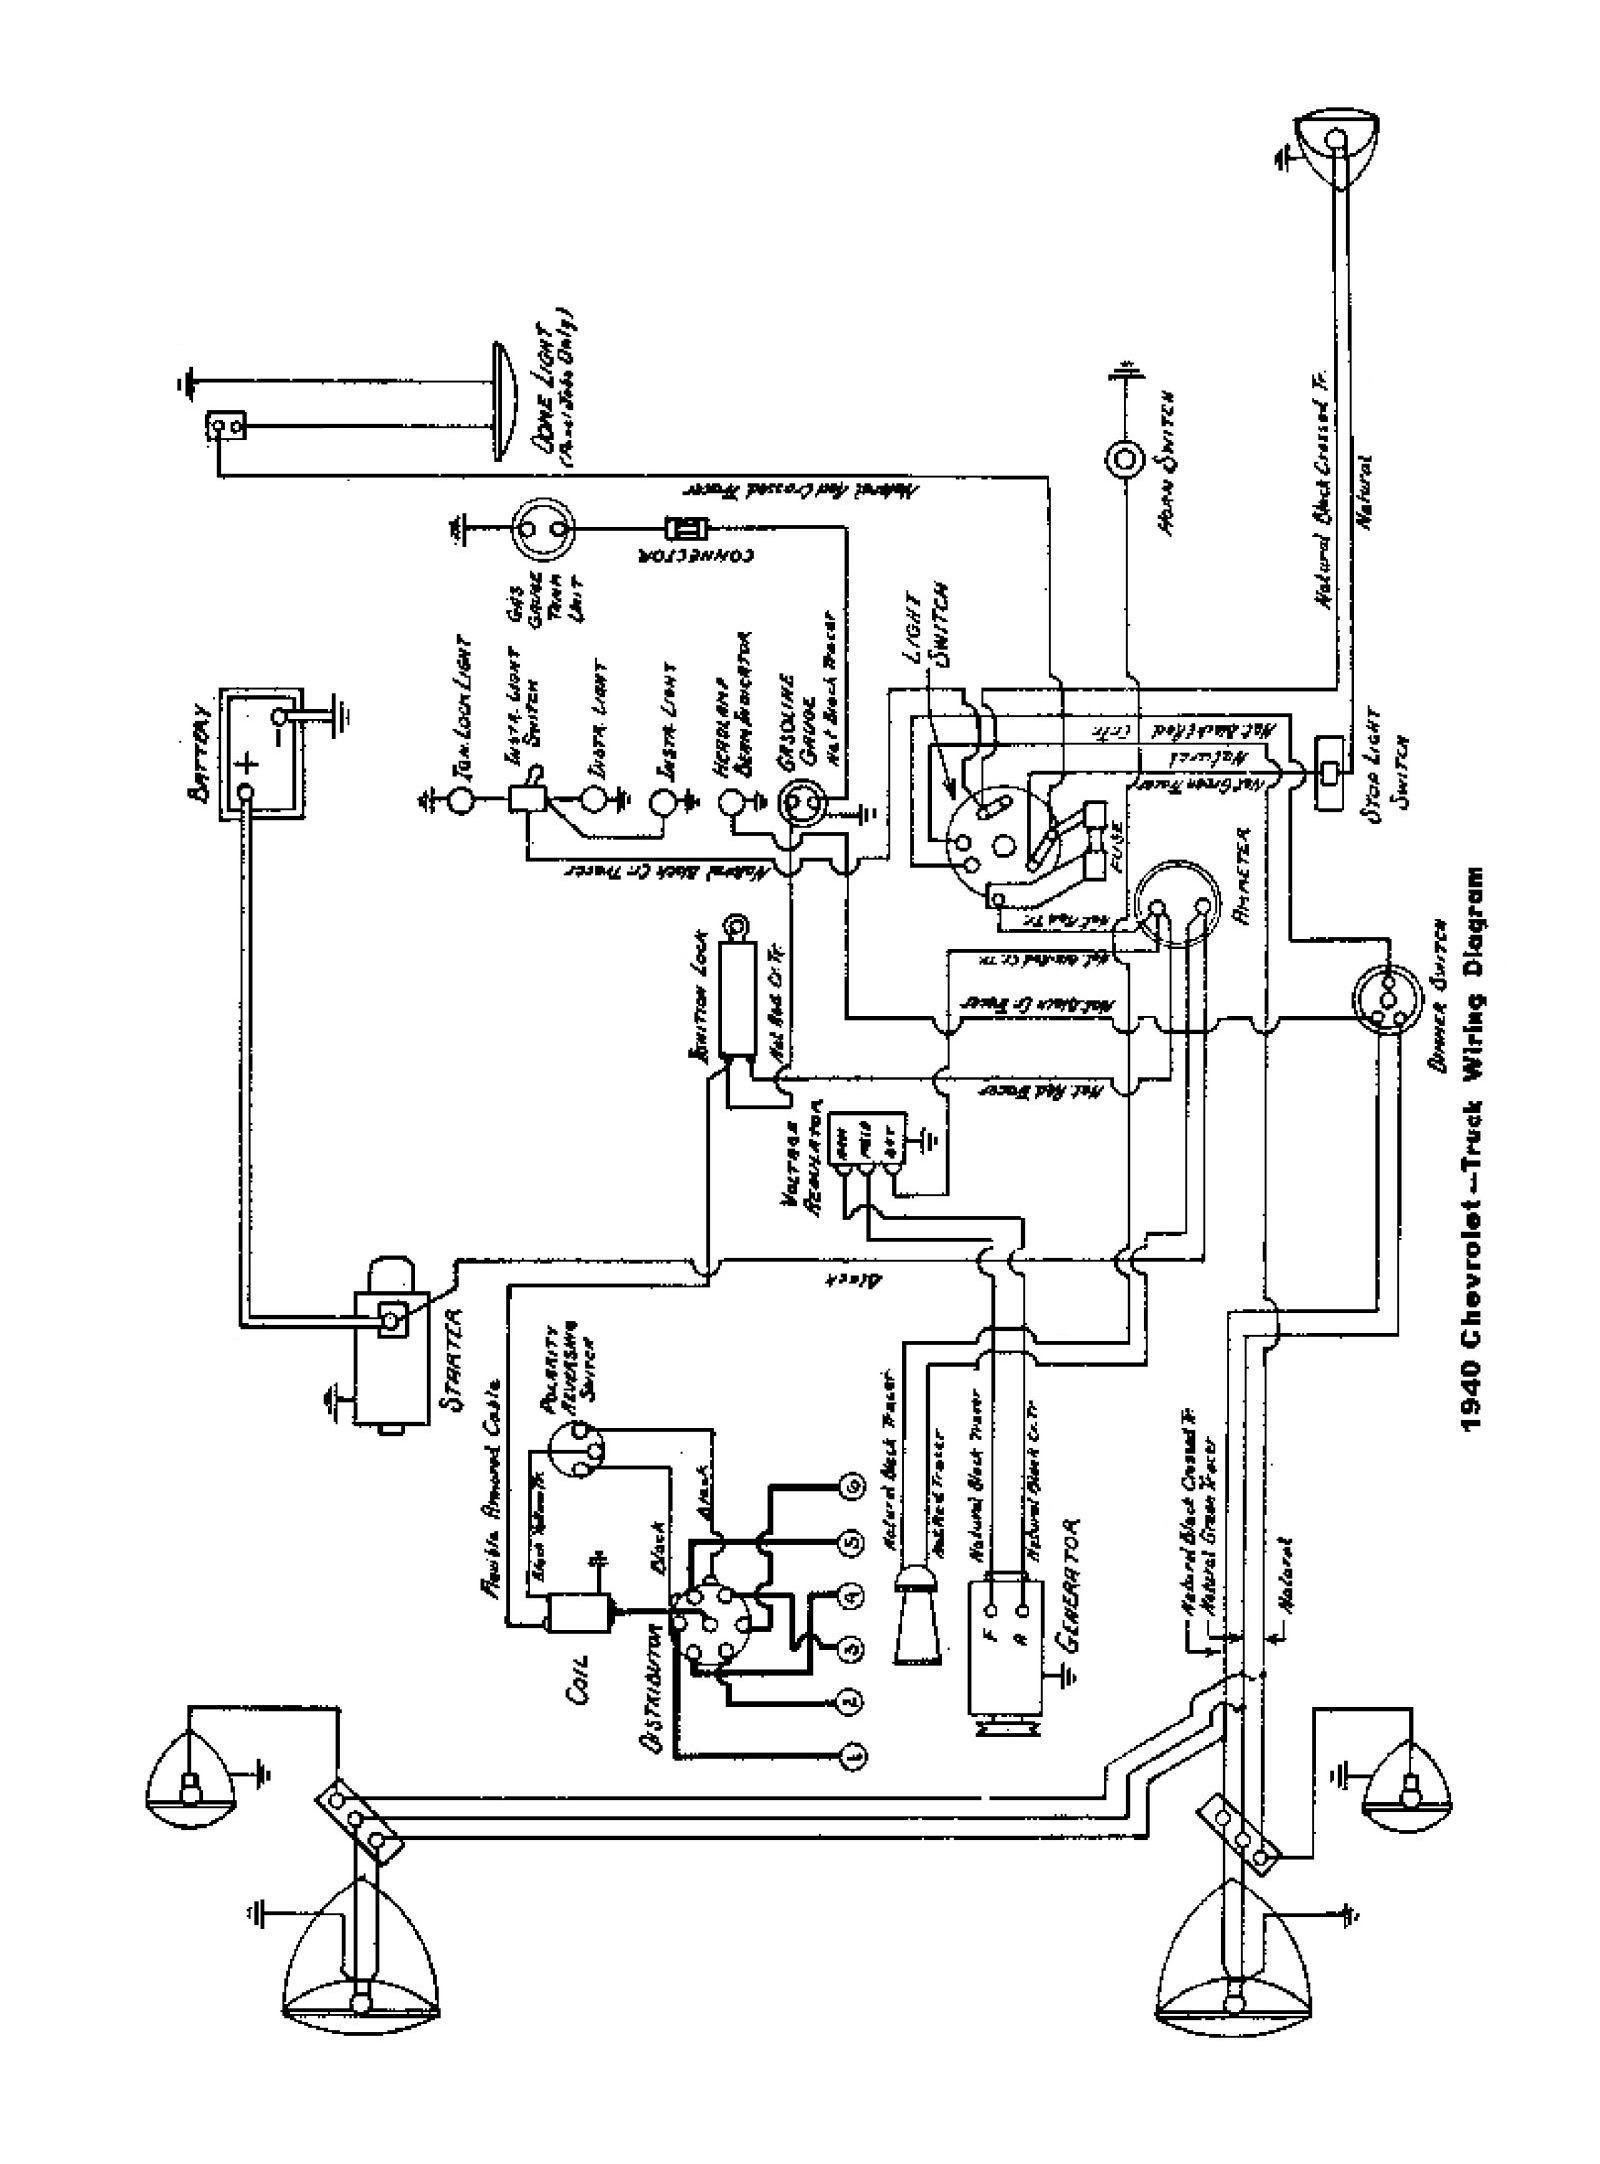 Marvelous 1957 Dodge Truck Wiring Diagram Basic Electronics Wiring Diagram Wiring Cloud Xortanetembamohammedshrineorg